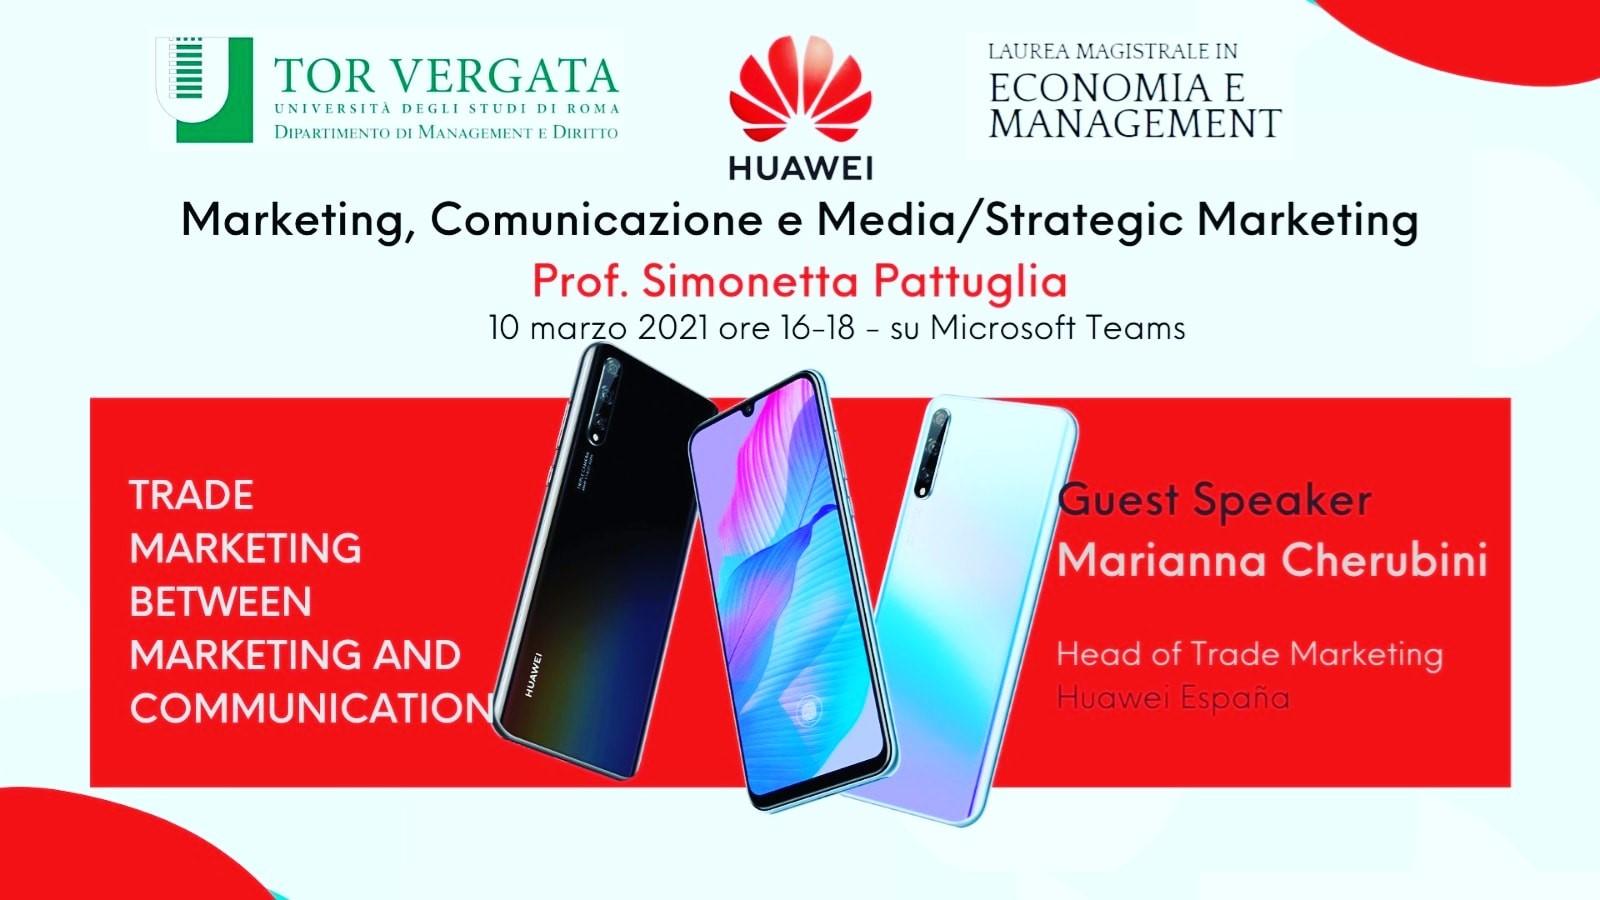 Trade Marketing between Marketing and Communication